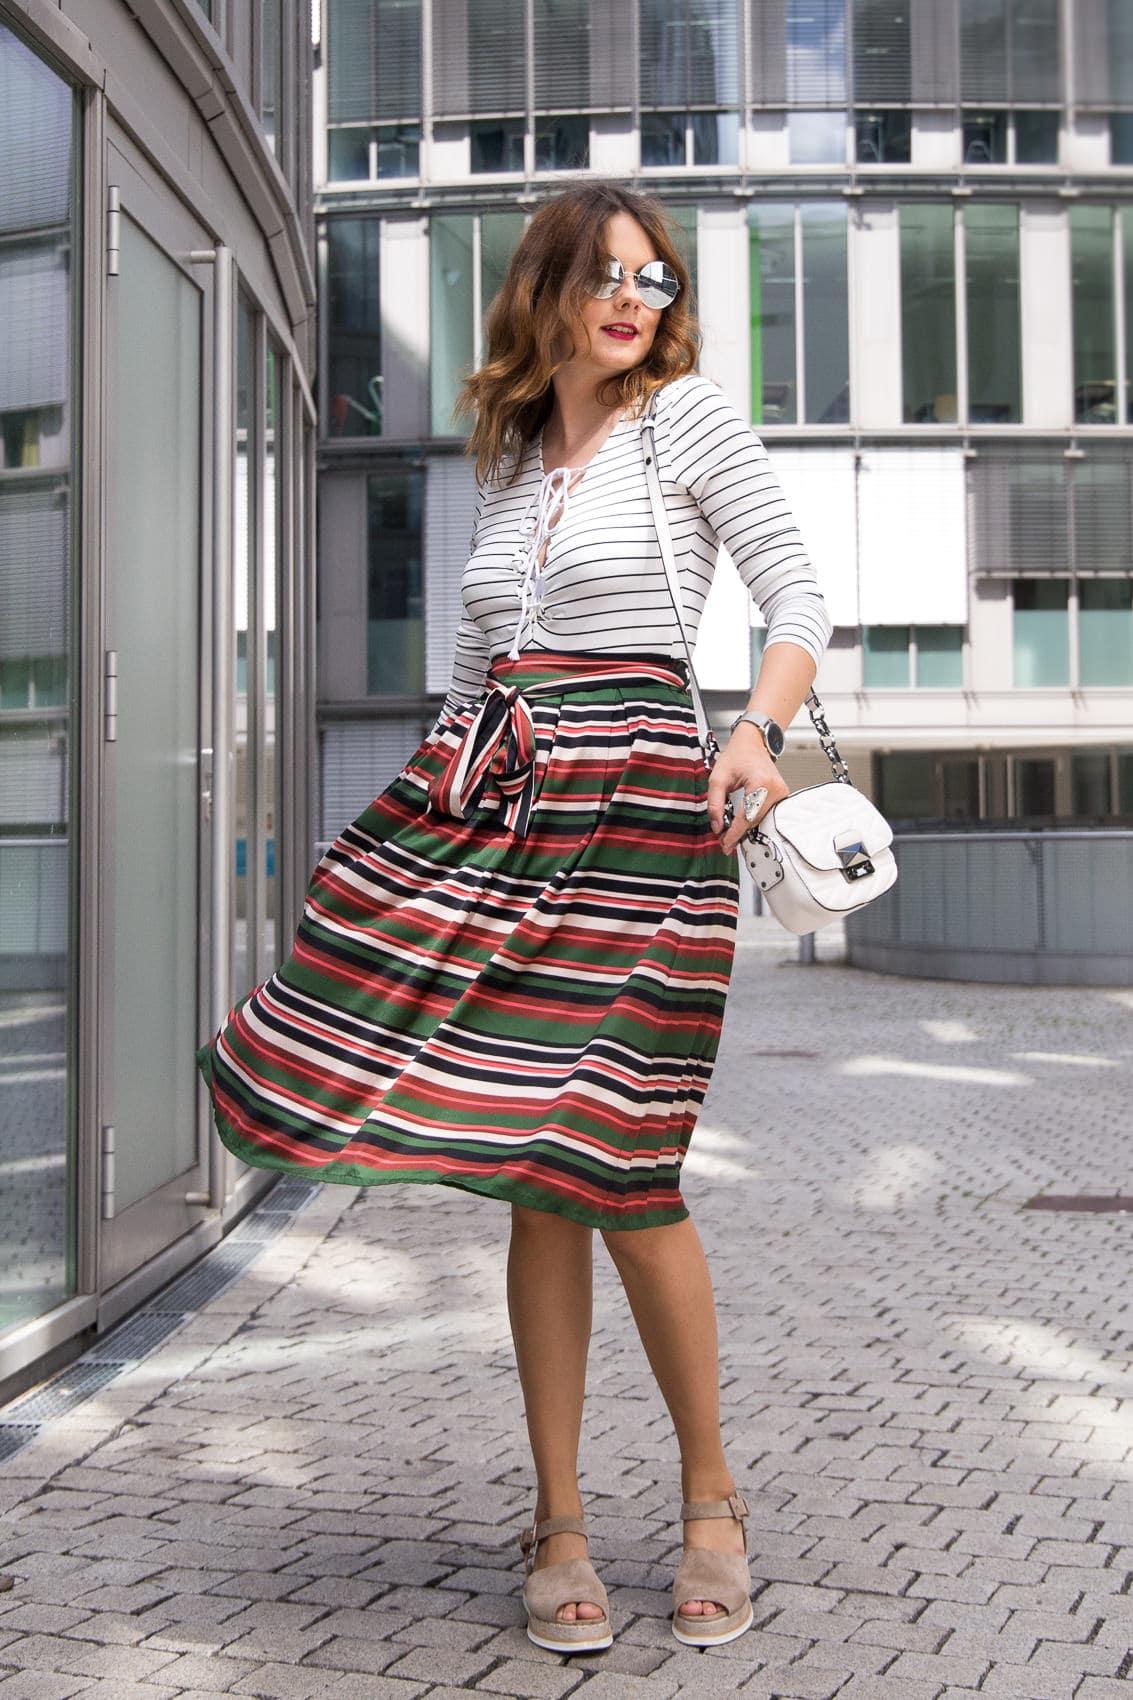 Sommer Lagerfeld Tasche MidirockPlatform Outfit Karl Sandalenamp; l1c5KJFuT3